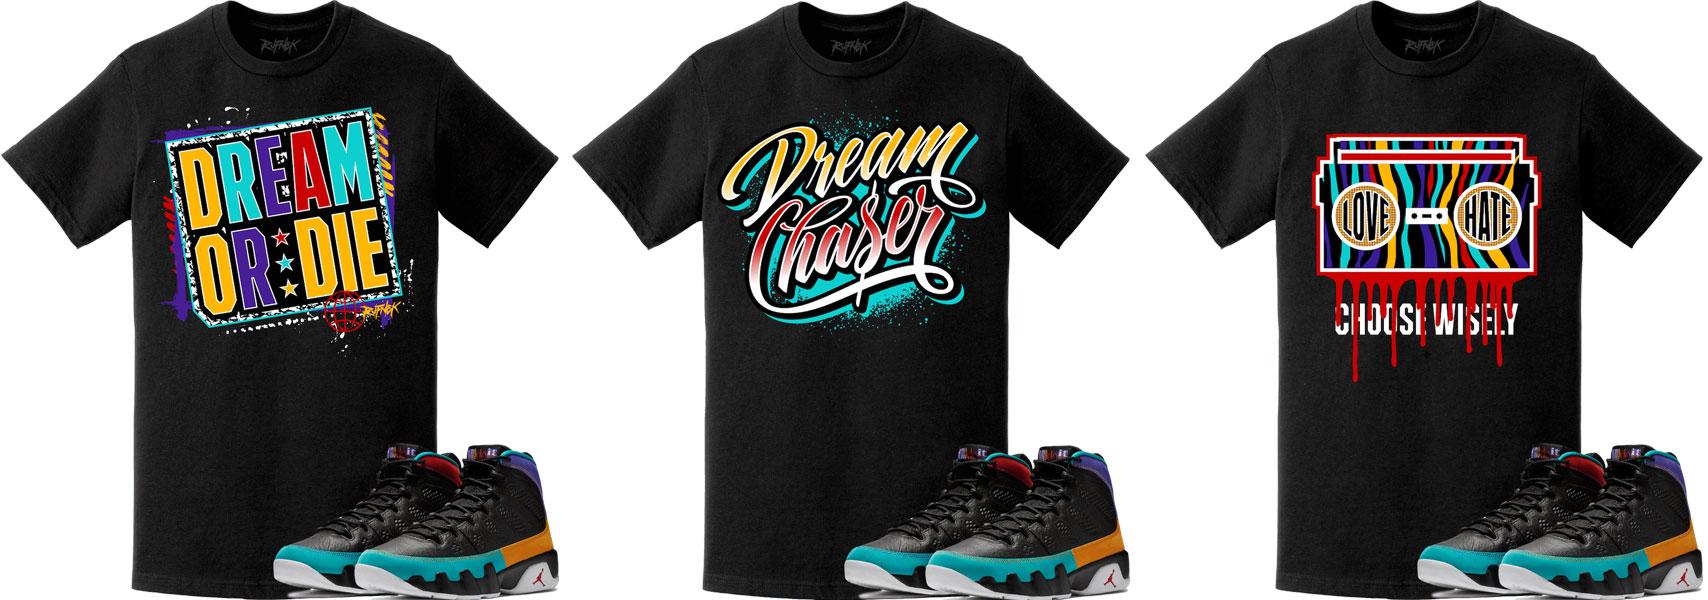 jordan-9-nostalgia-dream-it-do-it-sneaker-shirts-rufnek